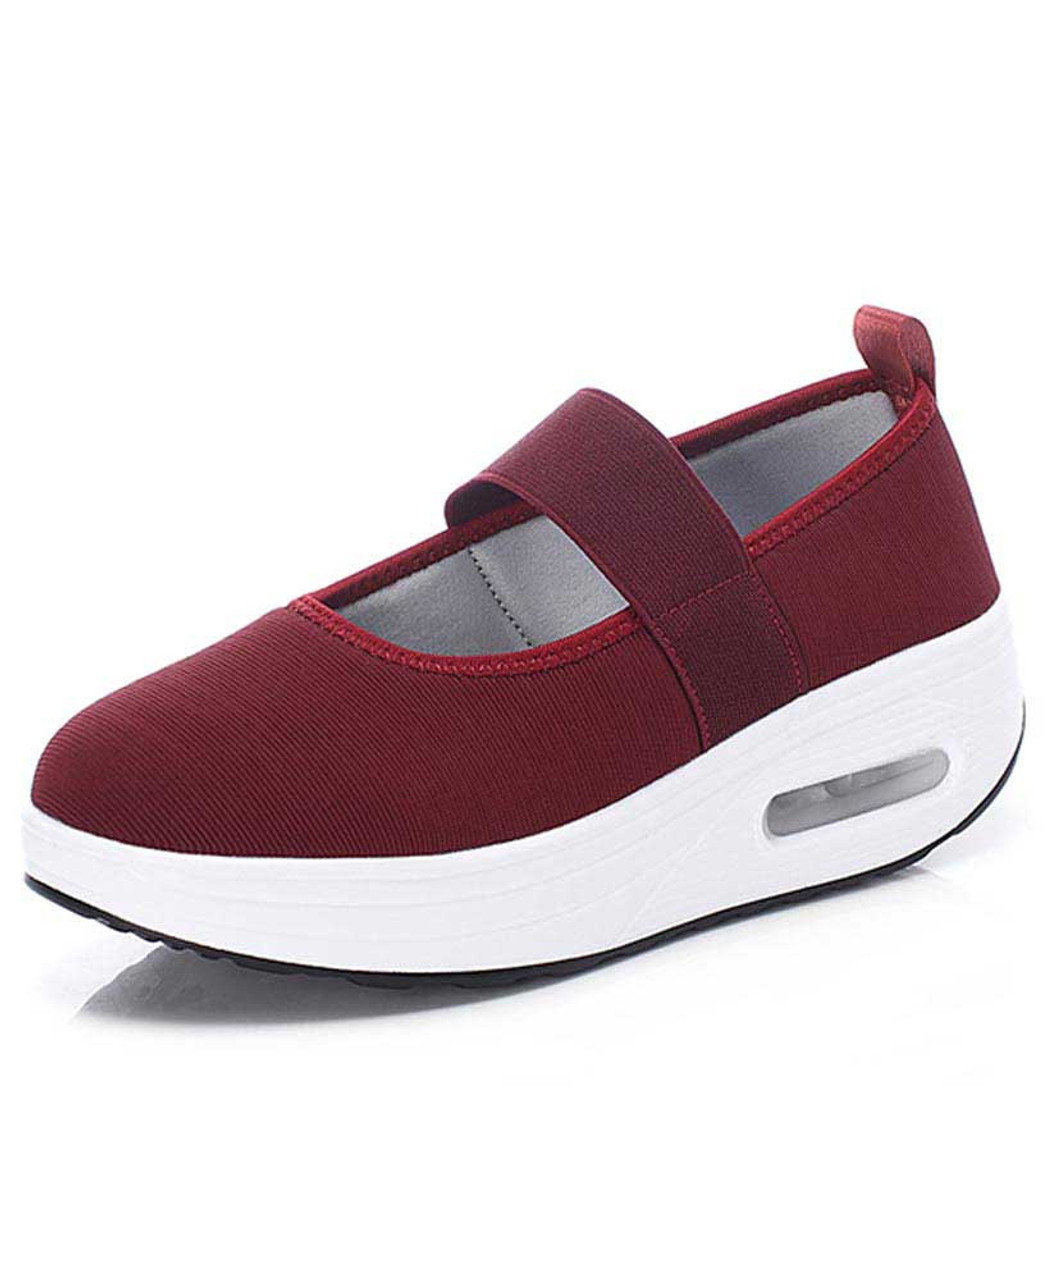 official photos 87149 96e6c Red low cut slip on rocker bottom shoe sneaker 1993